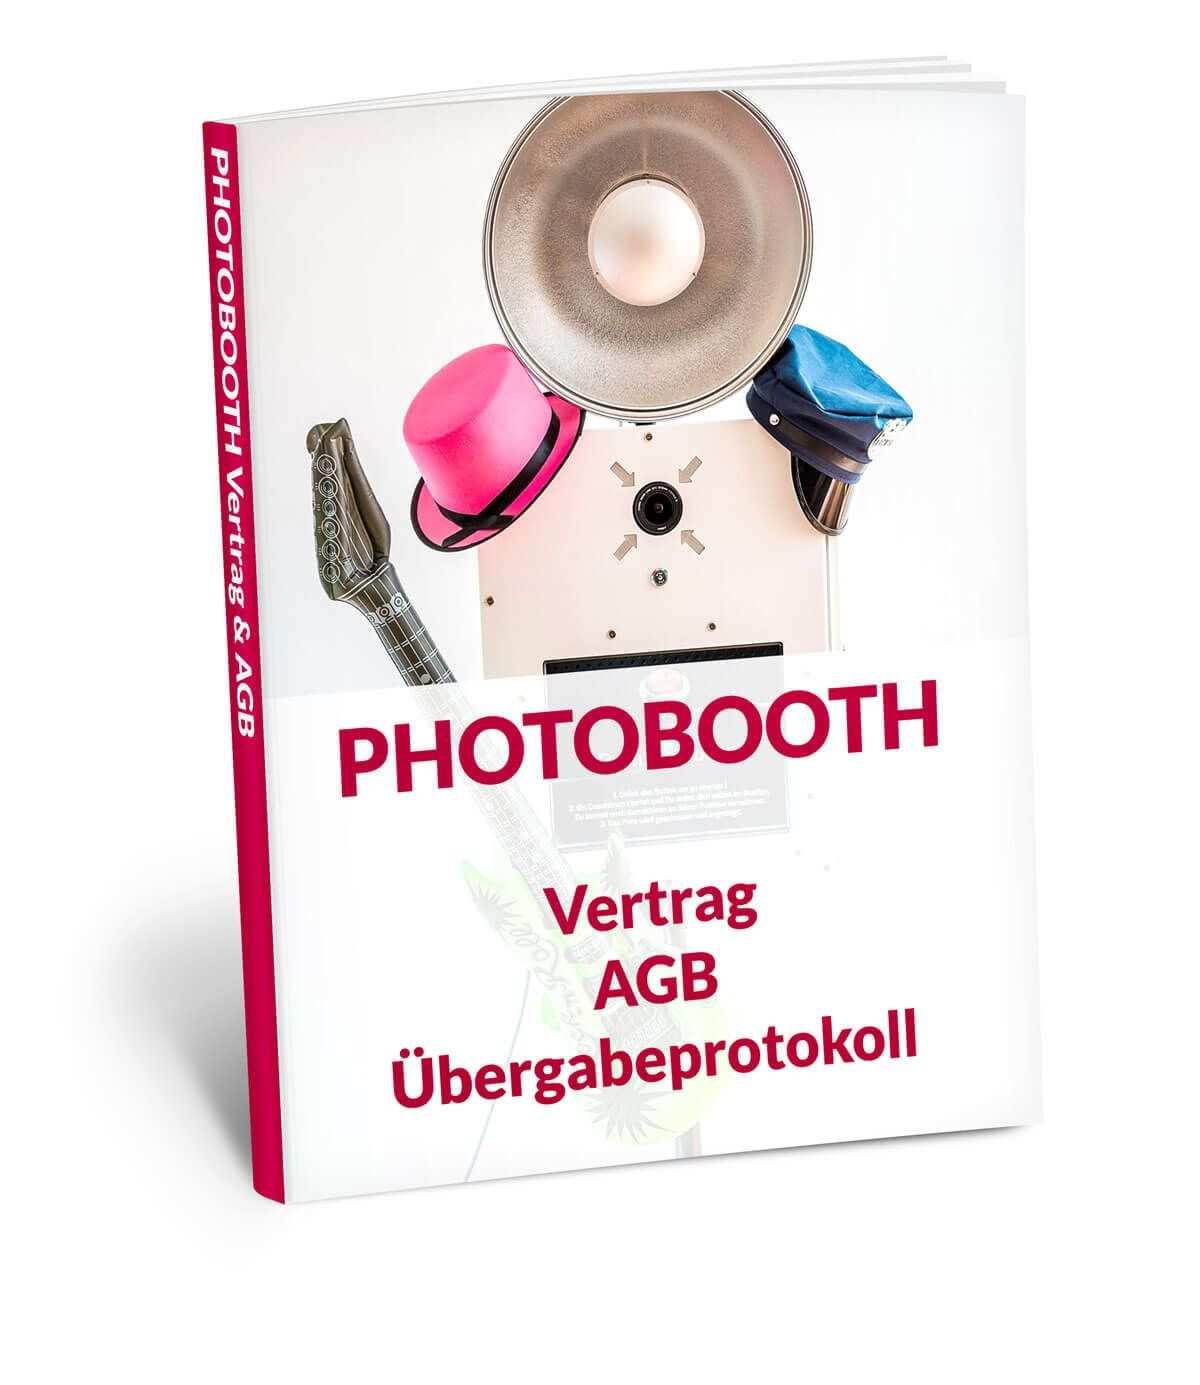 Photobooth Vertrag Fotobox Mietvertrag Agb Ubergabeprotokoll Diefotomanufaktur Fotostudio Winsen Fotokurs Hamburg Luneburg Winsen Photobooth Hamburg Fotobox Fotostudio Hamburg Shops